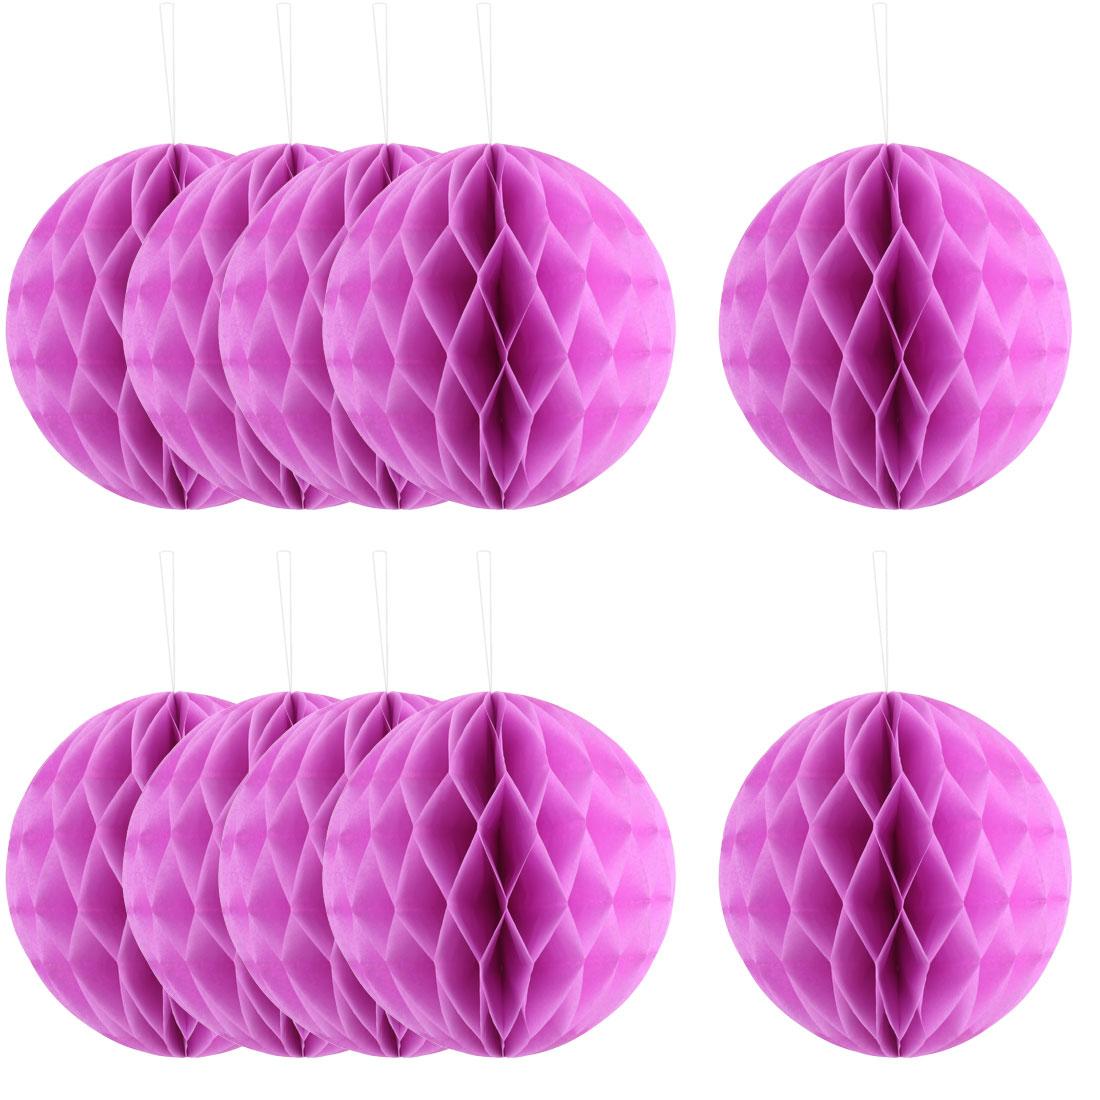 Festival Paper Handmade DIY Hanging Decor Honeycomb Ball Lantern Light Purple 8 Inches 10pcs